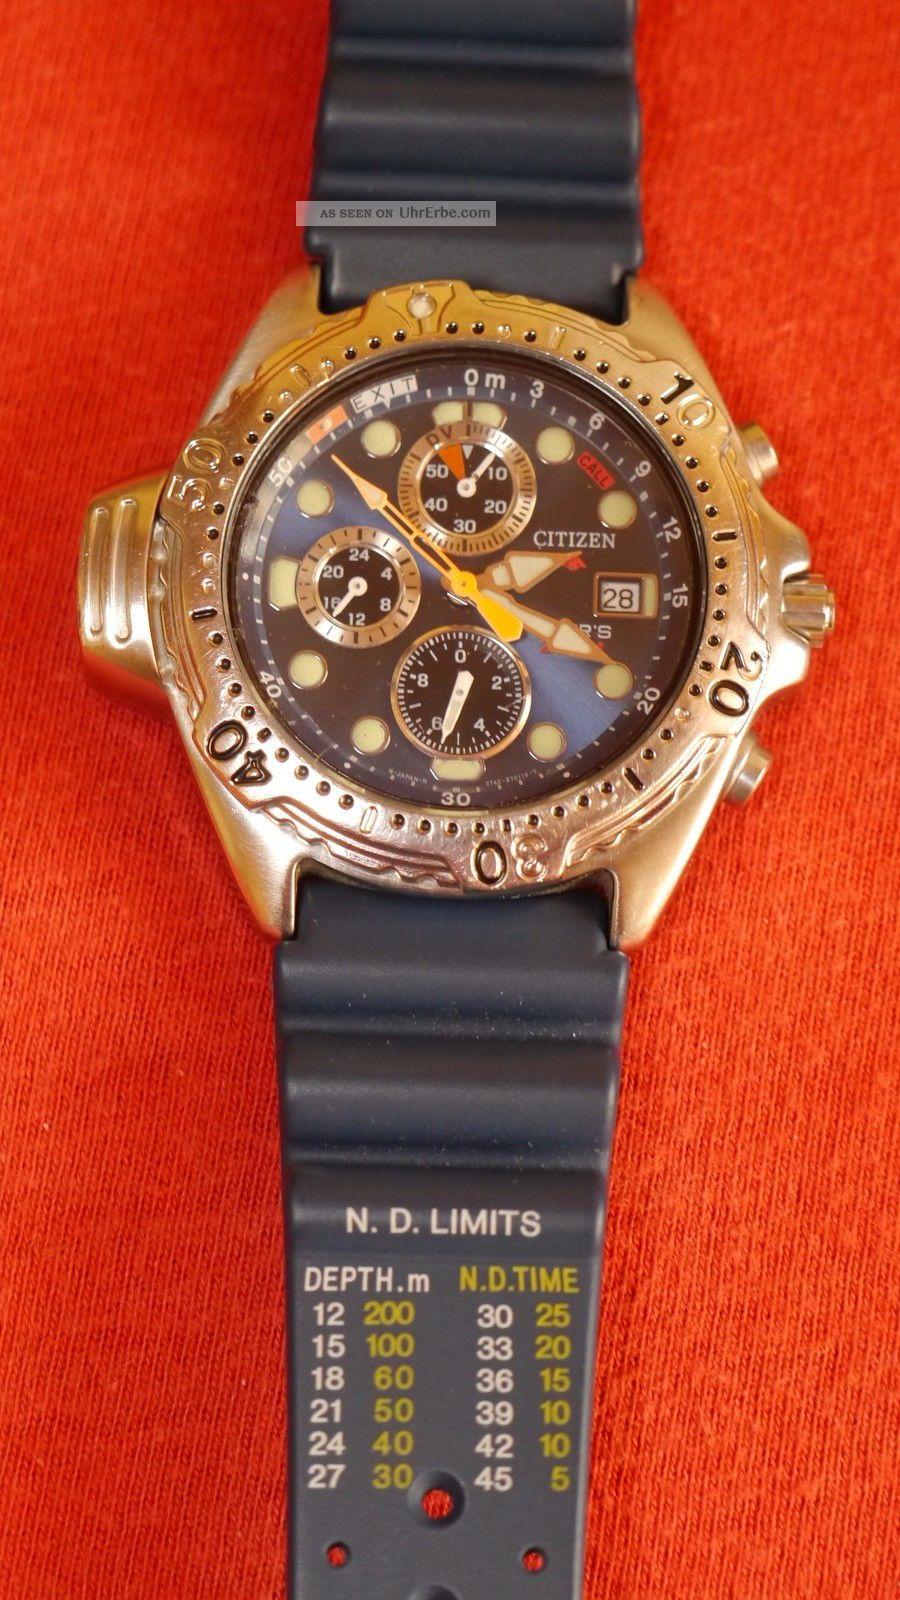 Armbanduhr Taucheruhr Citizen Aqualand Chronograph Armbanduhren Bild